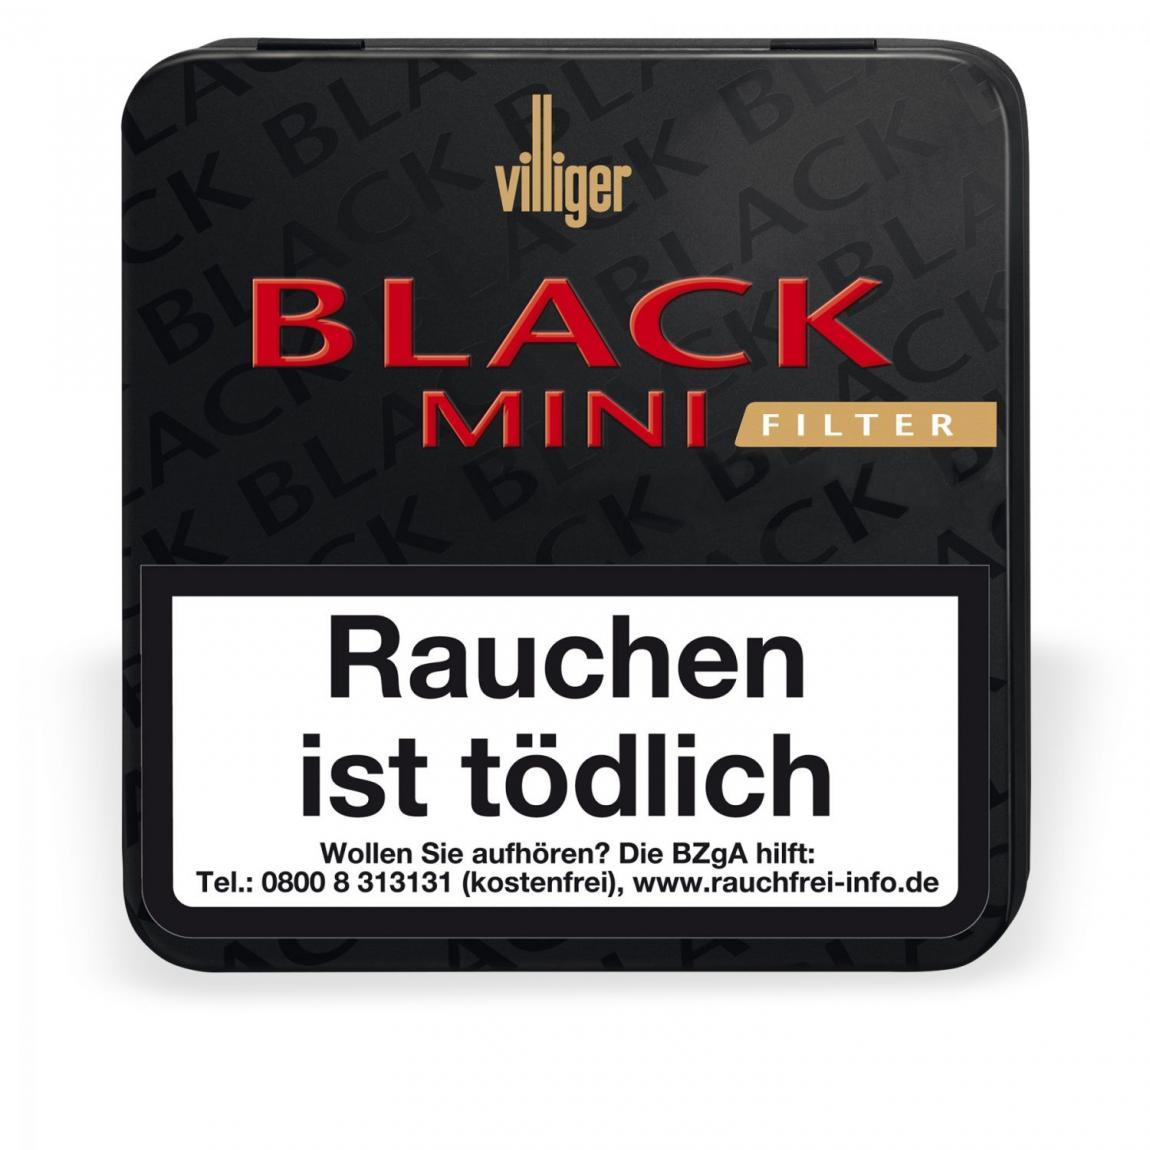 Villiger Black Mini mit Filter 20er Metallschachtel